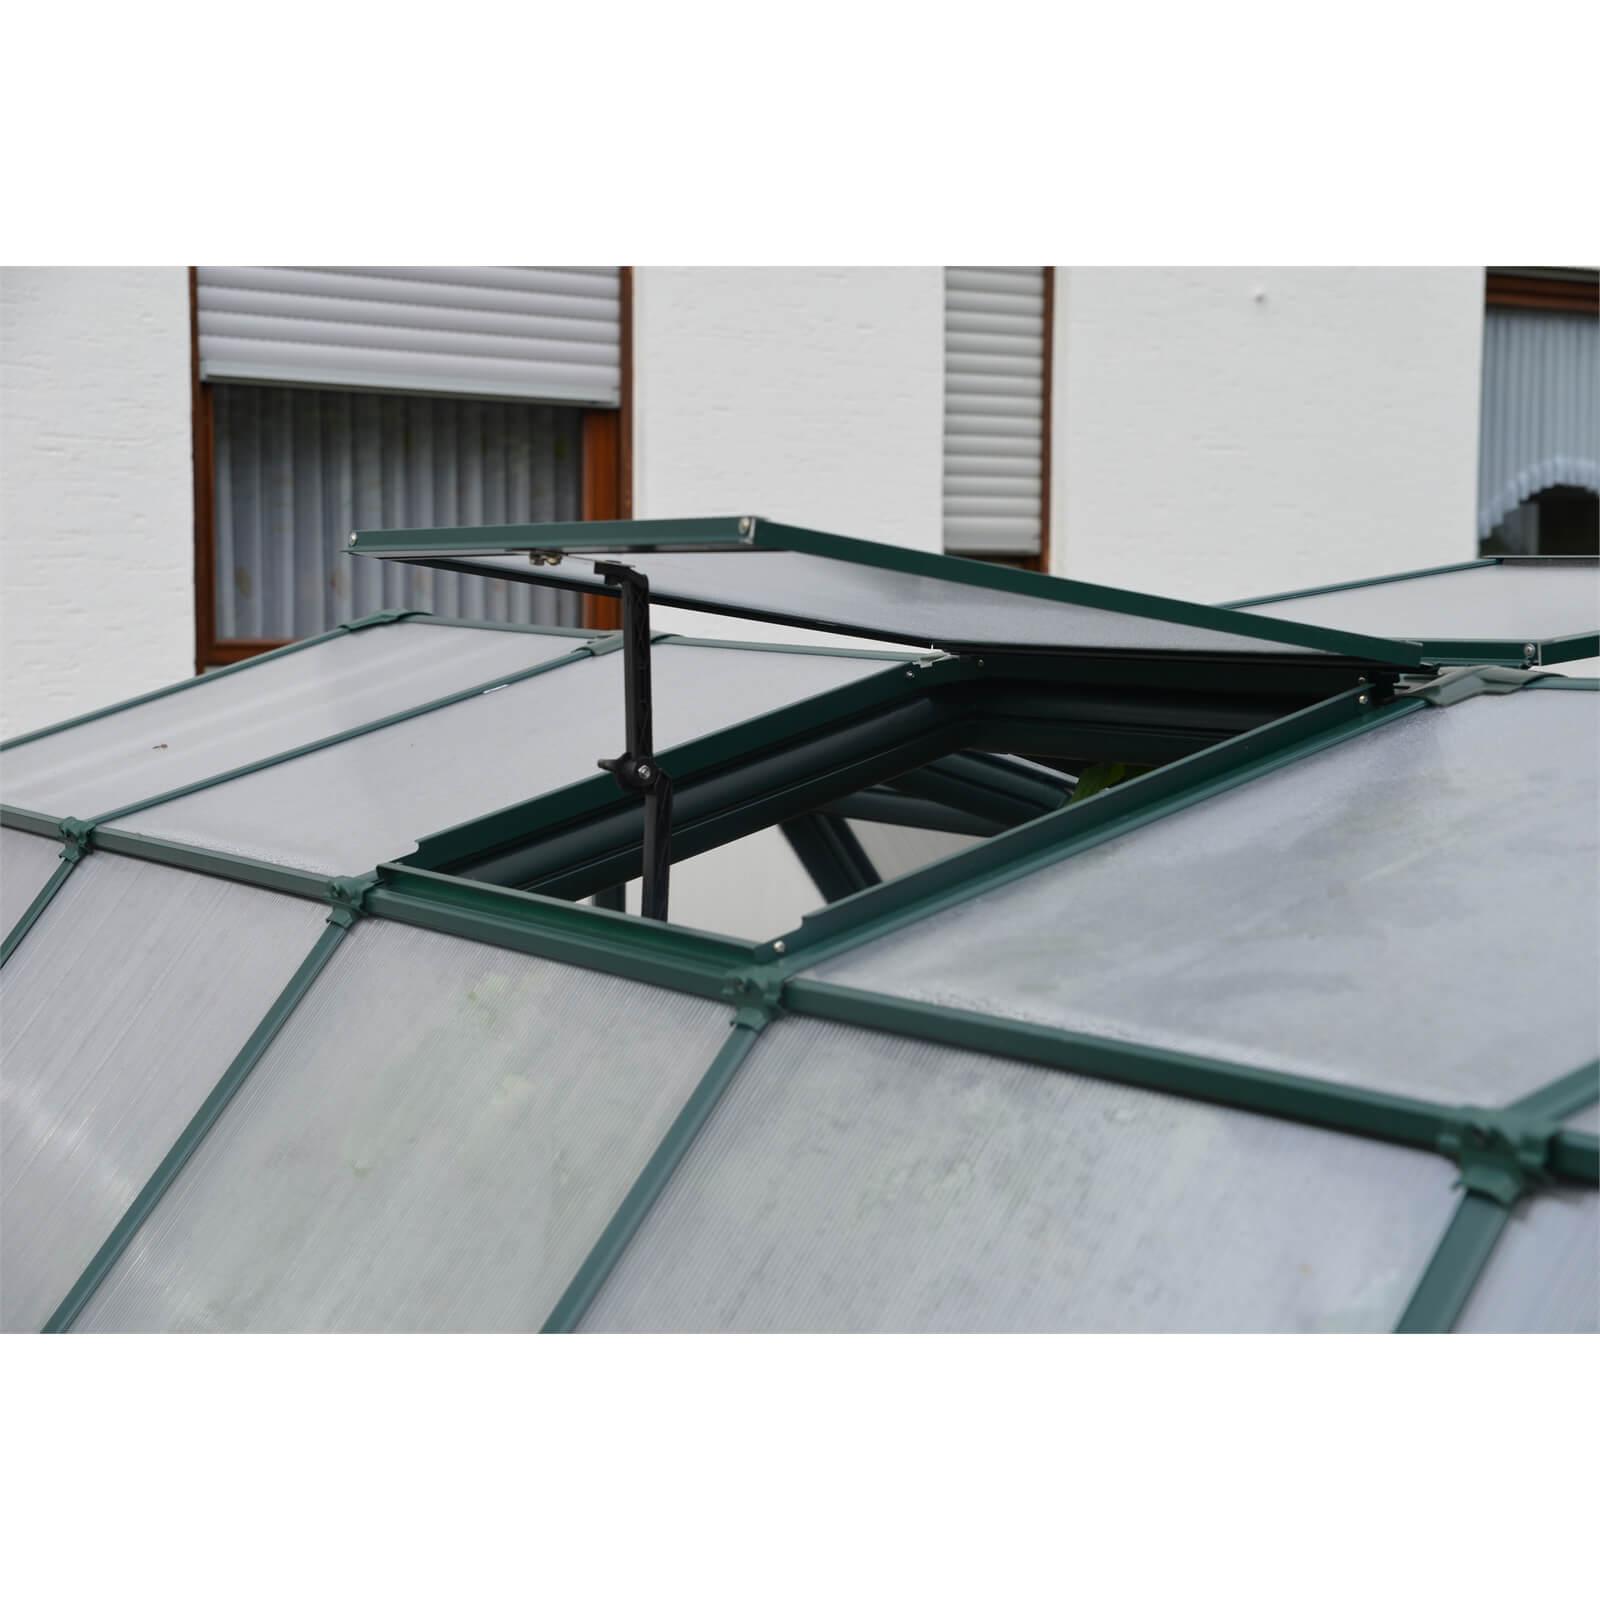 Palram - Canopia - Canopia Grand/Hobby Roof Greenhouse Vent Kit